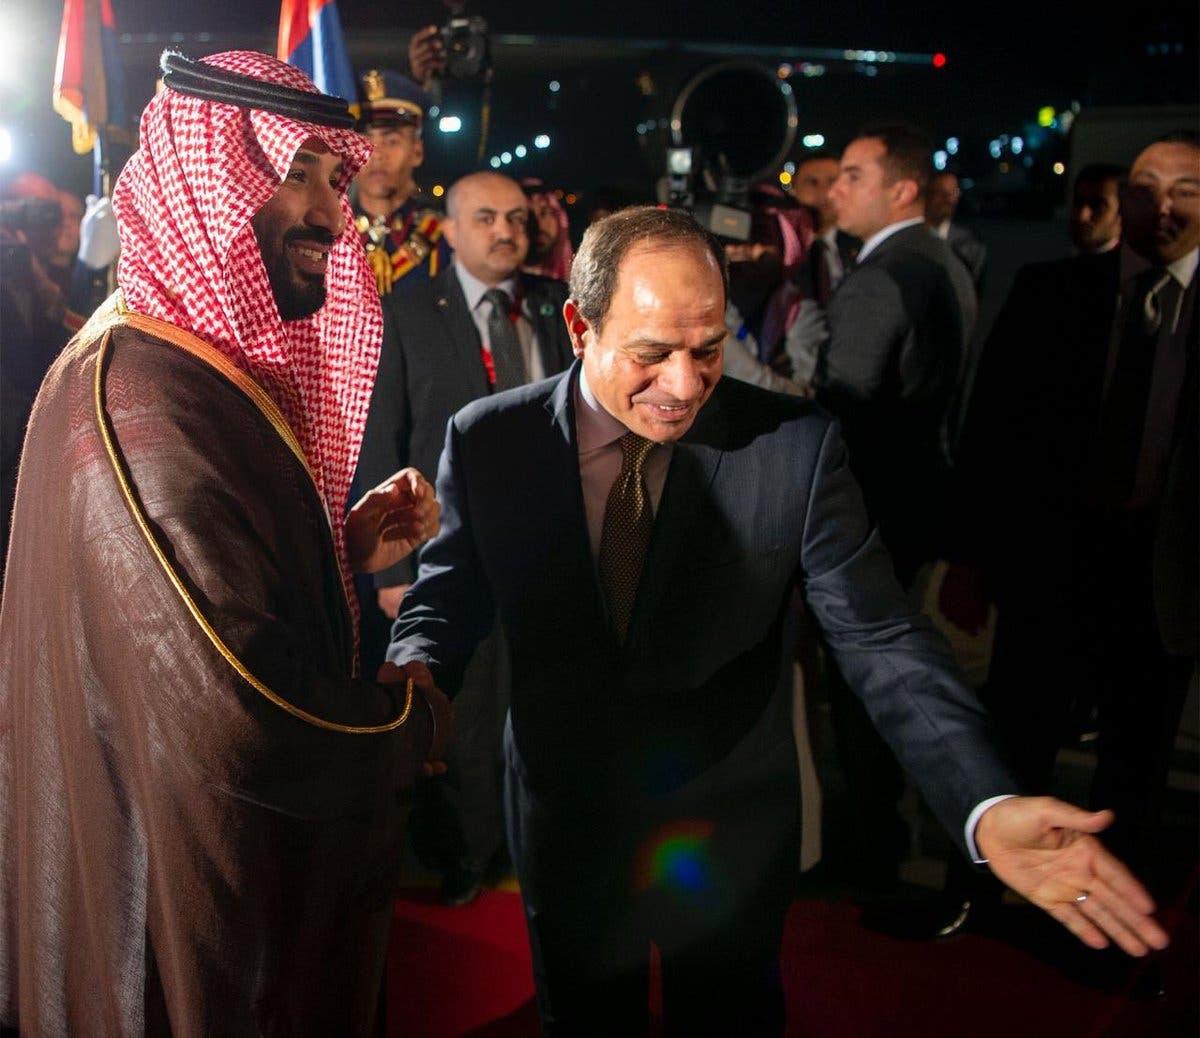 Saudi Arabia's Crown prince arrives in Cairo in third leg of regional tour